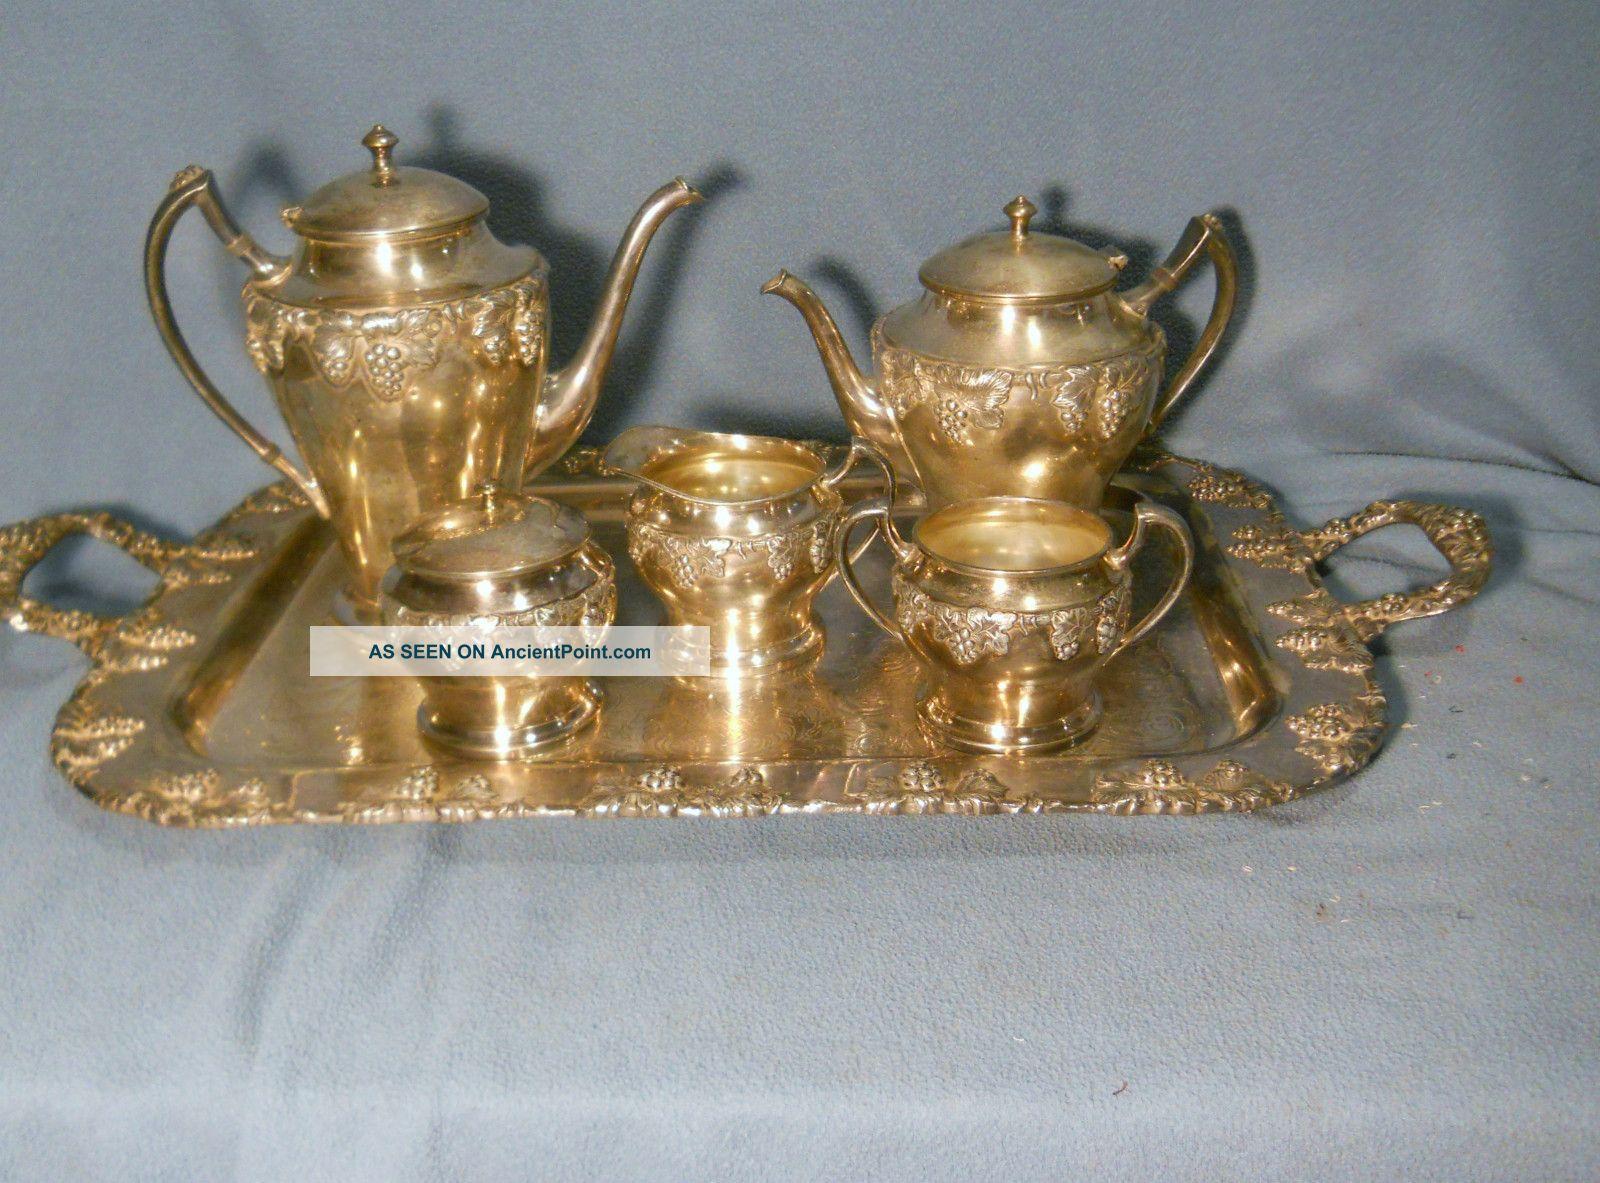 Vintage 6 Piece Complete (including Tray) Tea Set - Crescent Silverplate 5292 Tea/Coffee Pots & Sets photo